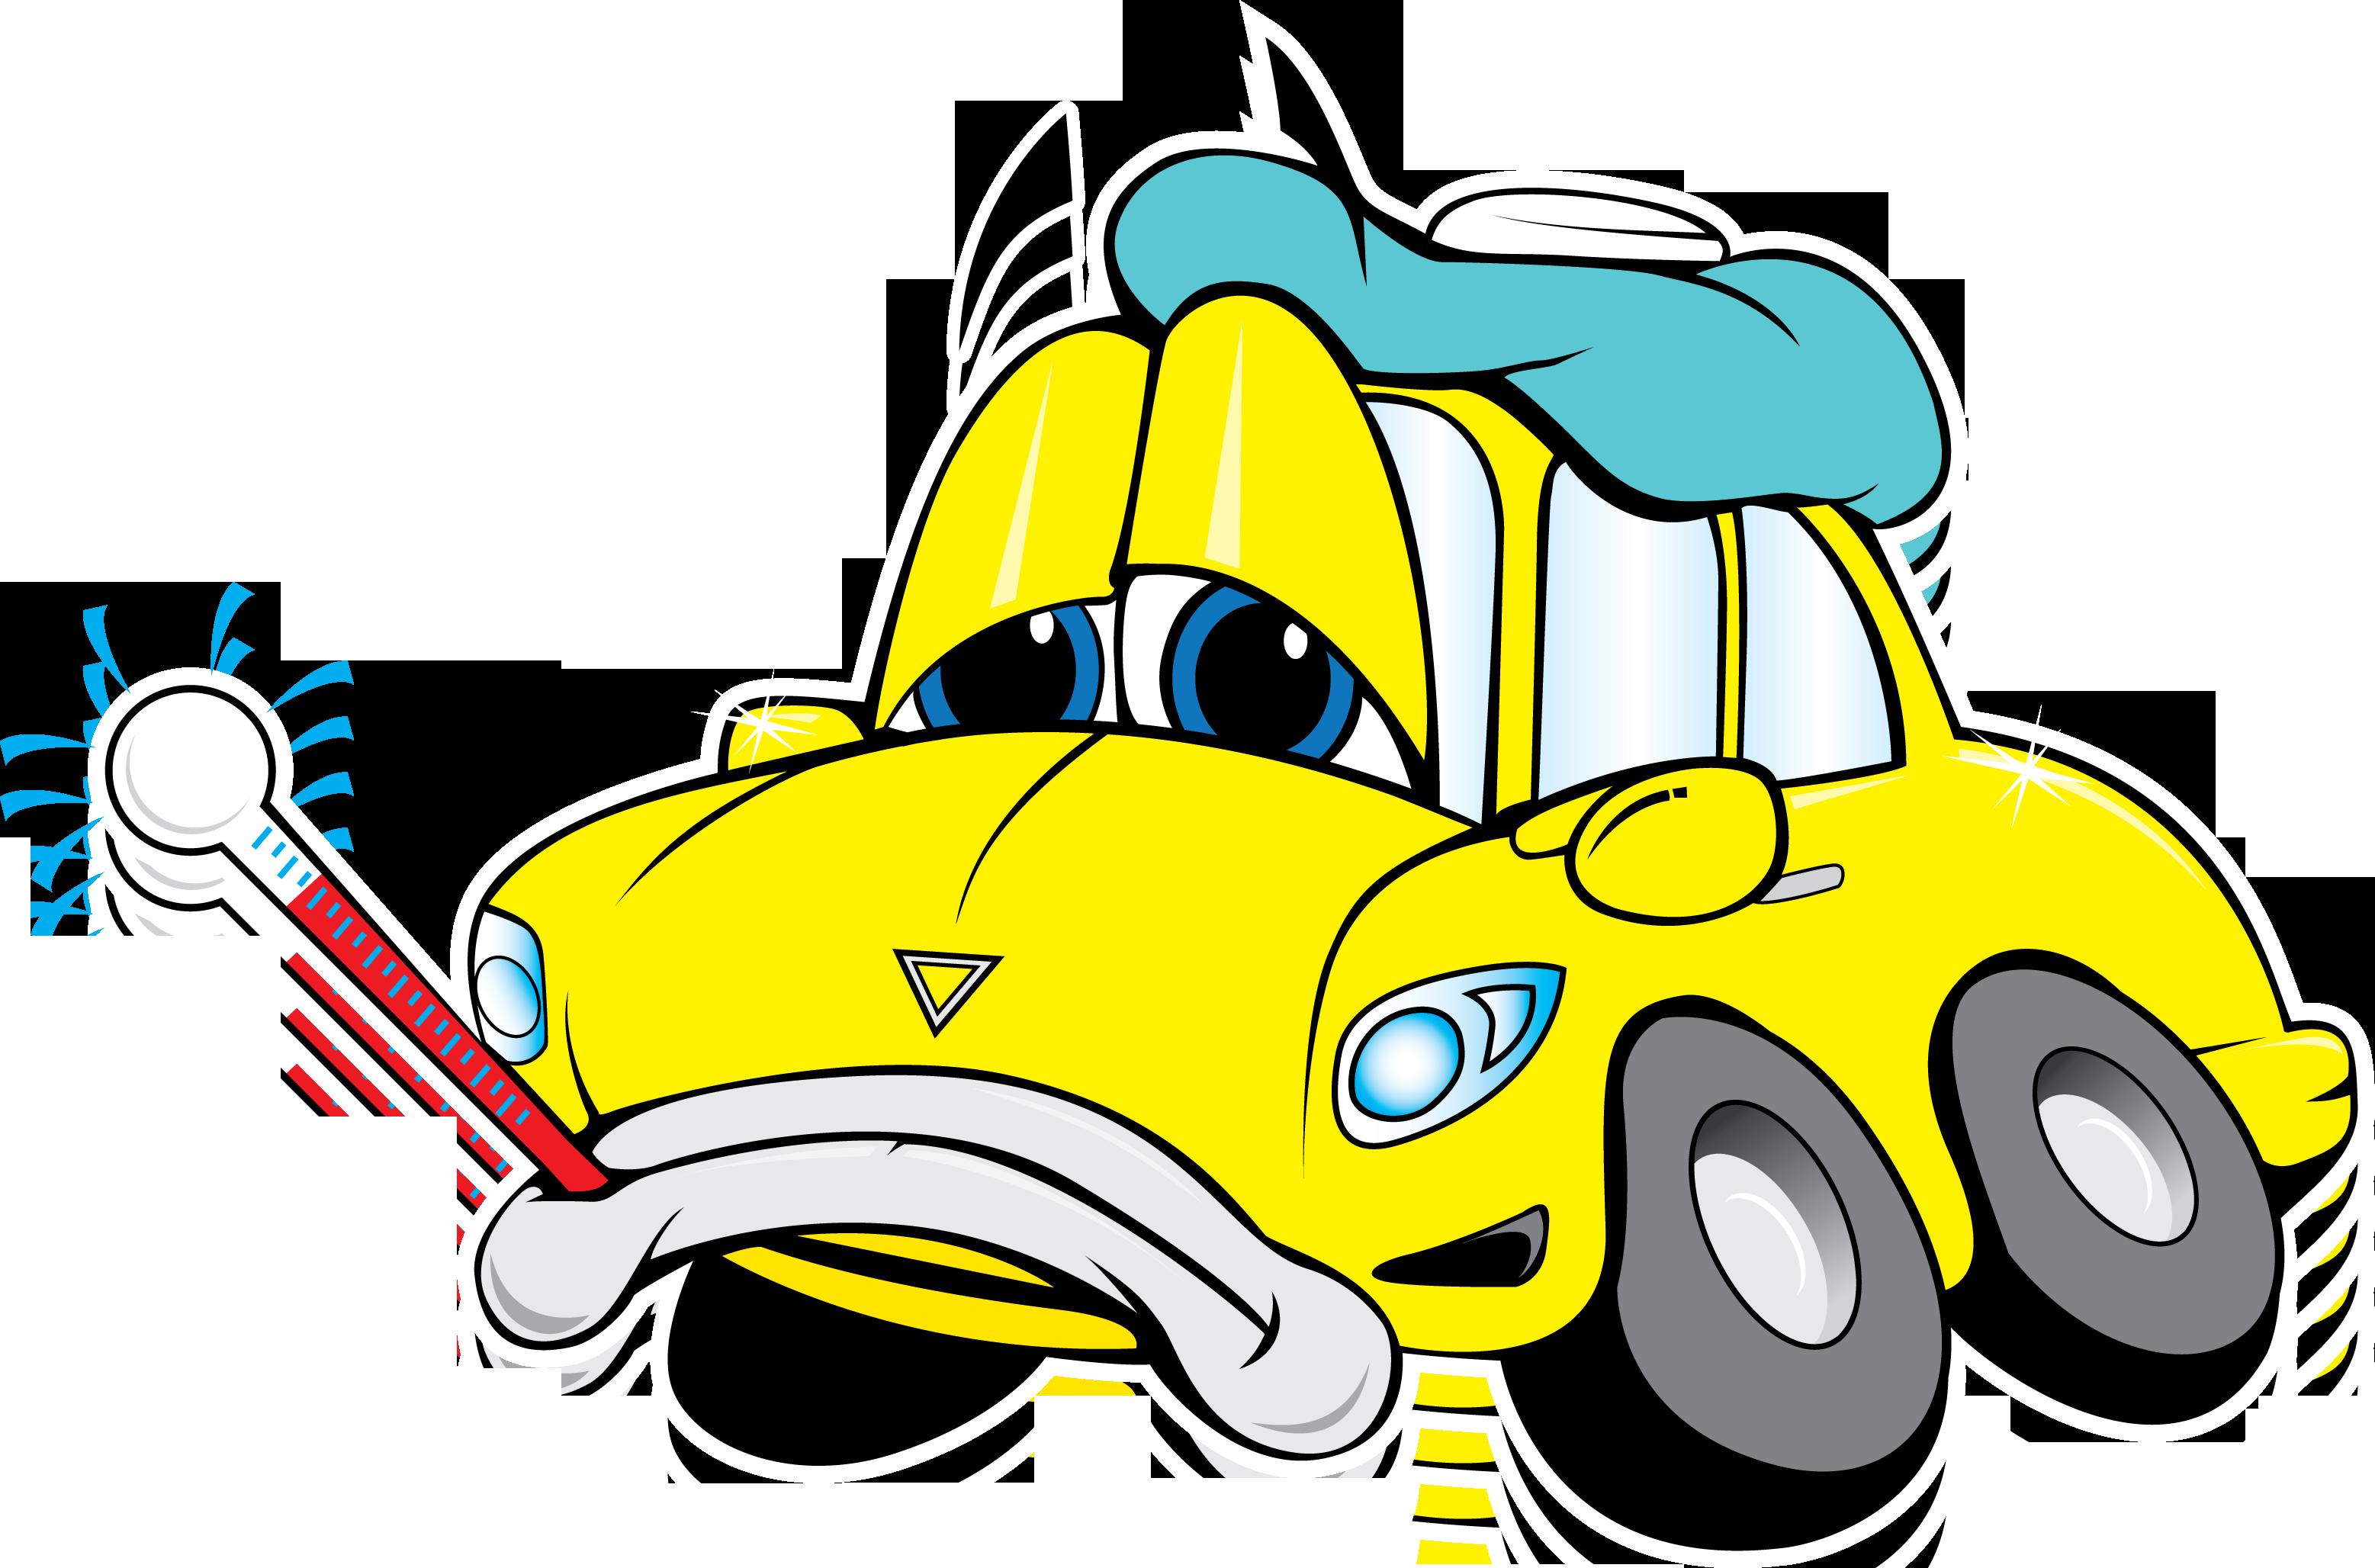 Summer cars clipart jpg transparent download Free Cartoon Car Images Free, Download Free Clip Art, Free ... jpg transparent download